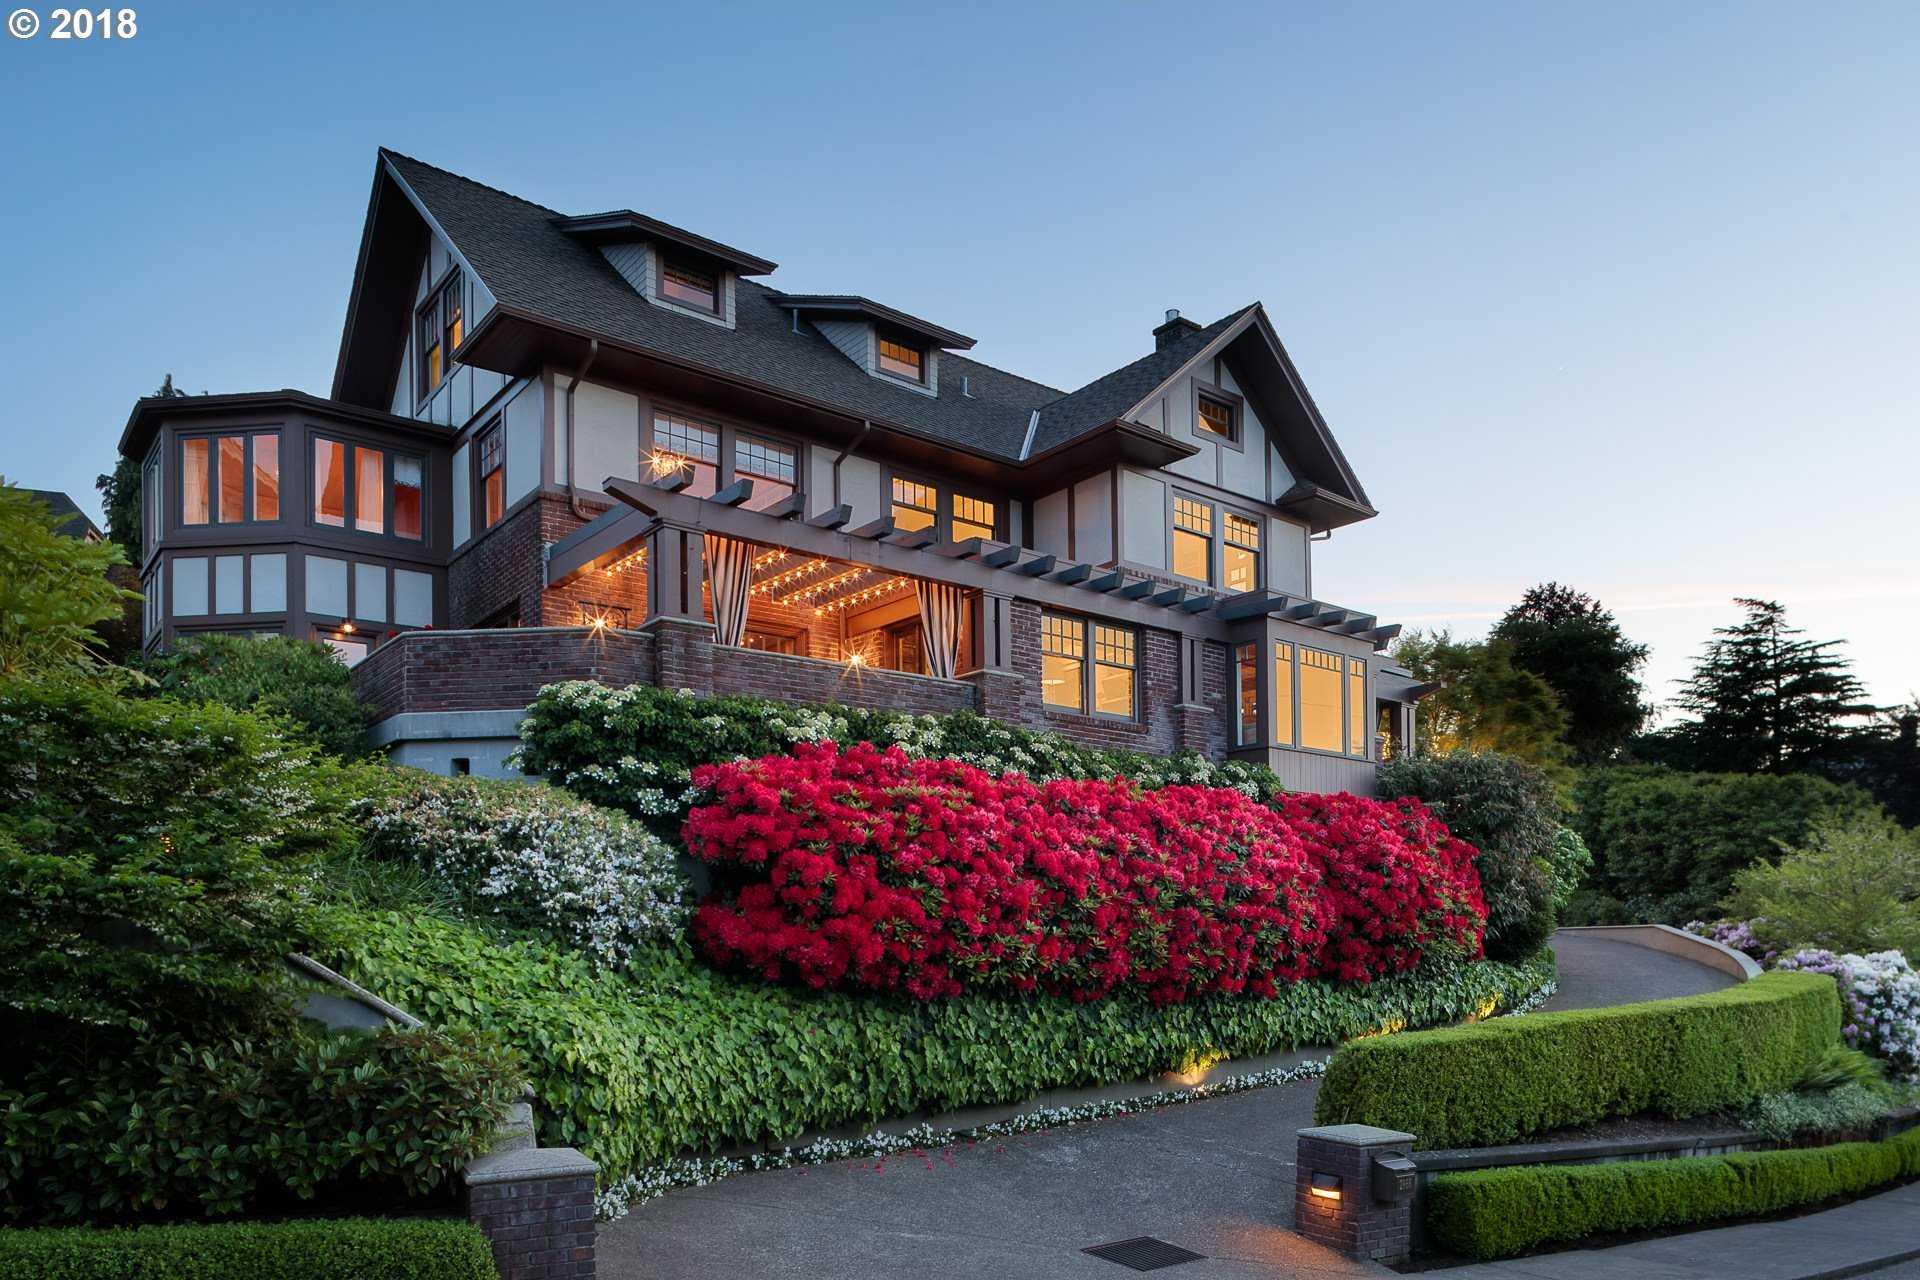 $2,280,000 - 5Br/5Ba -  for Sale in Westover Terraces, Portland